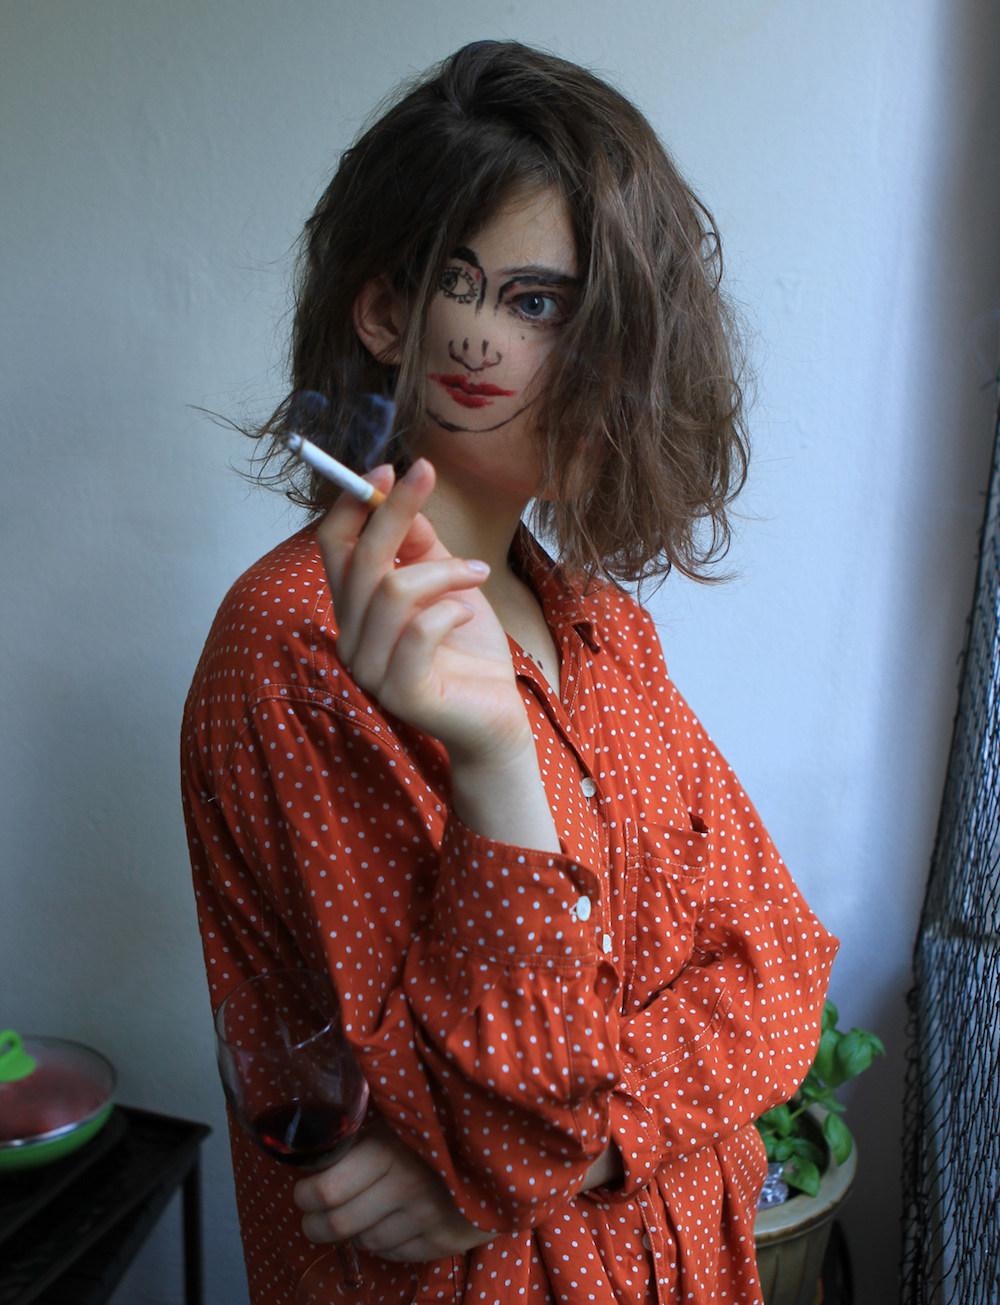 fotografia-arte-ritratti-ragazza-doppio-volto-doubleface-sebastian-Bieniek-13